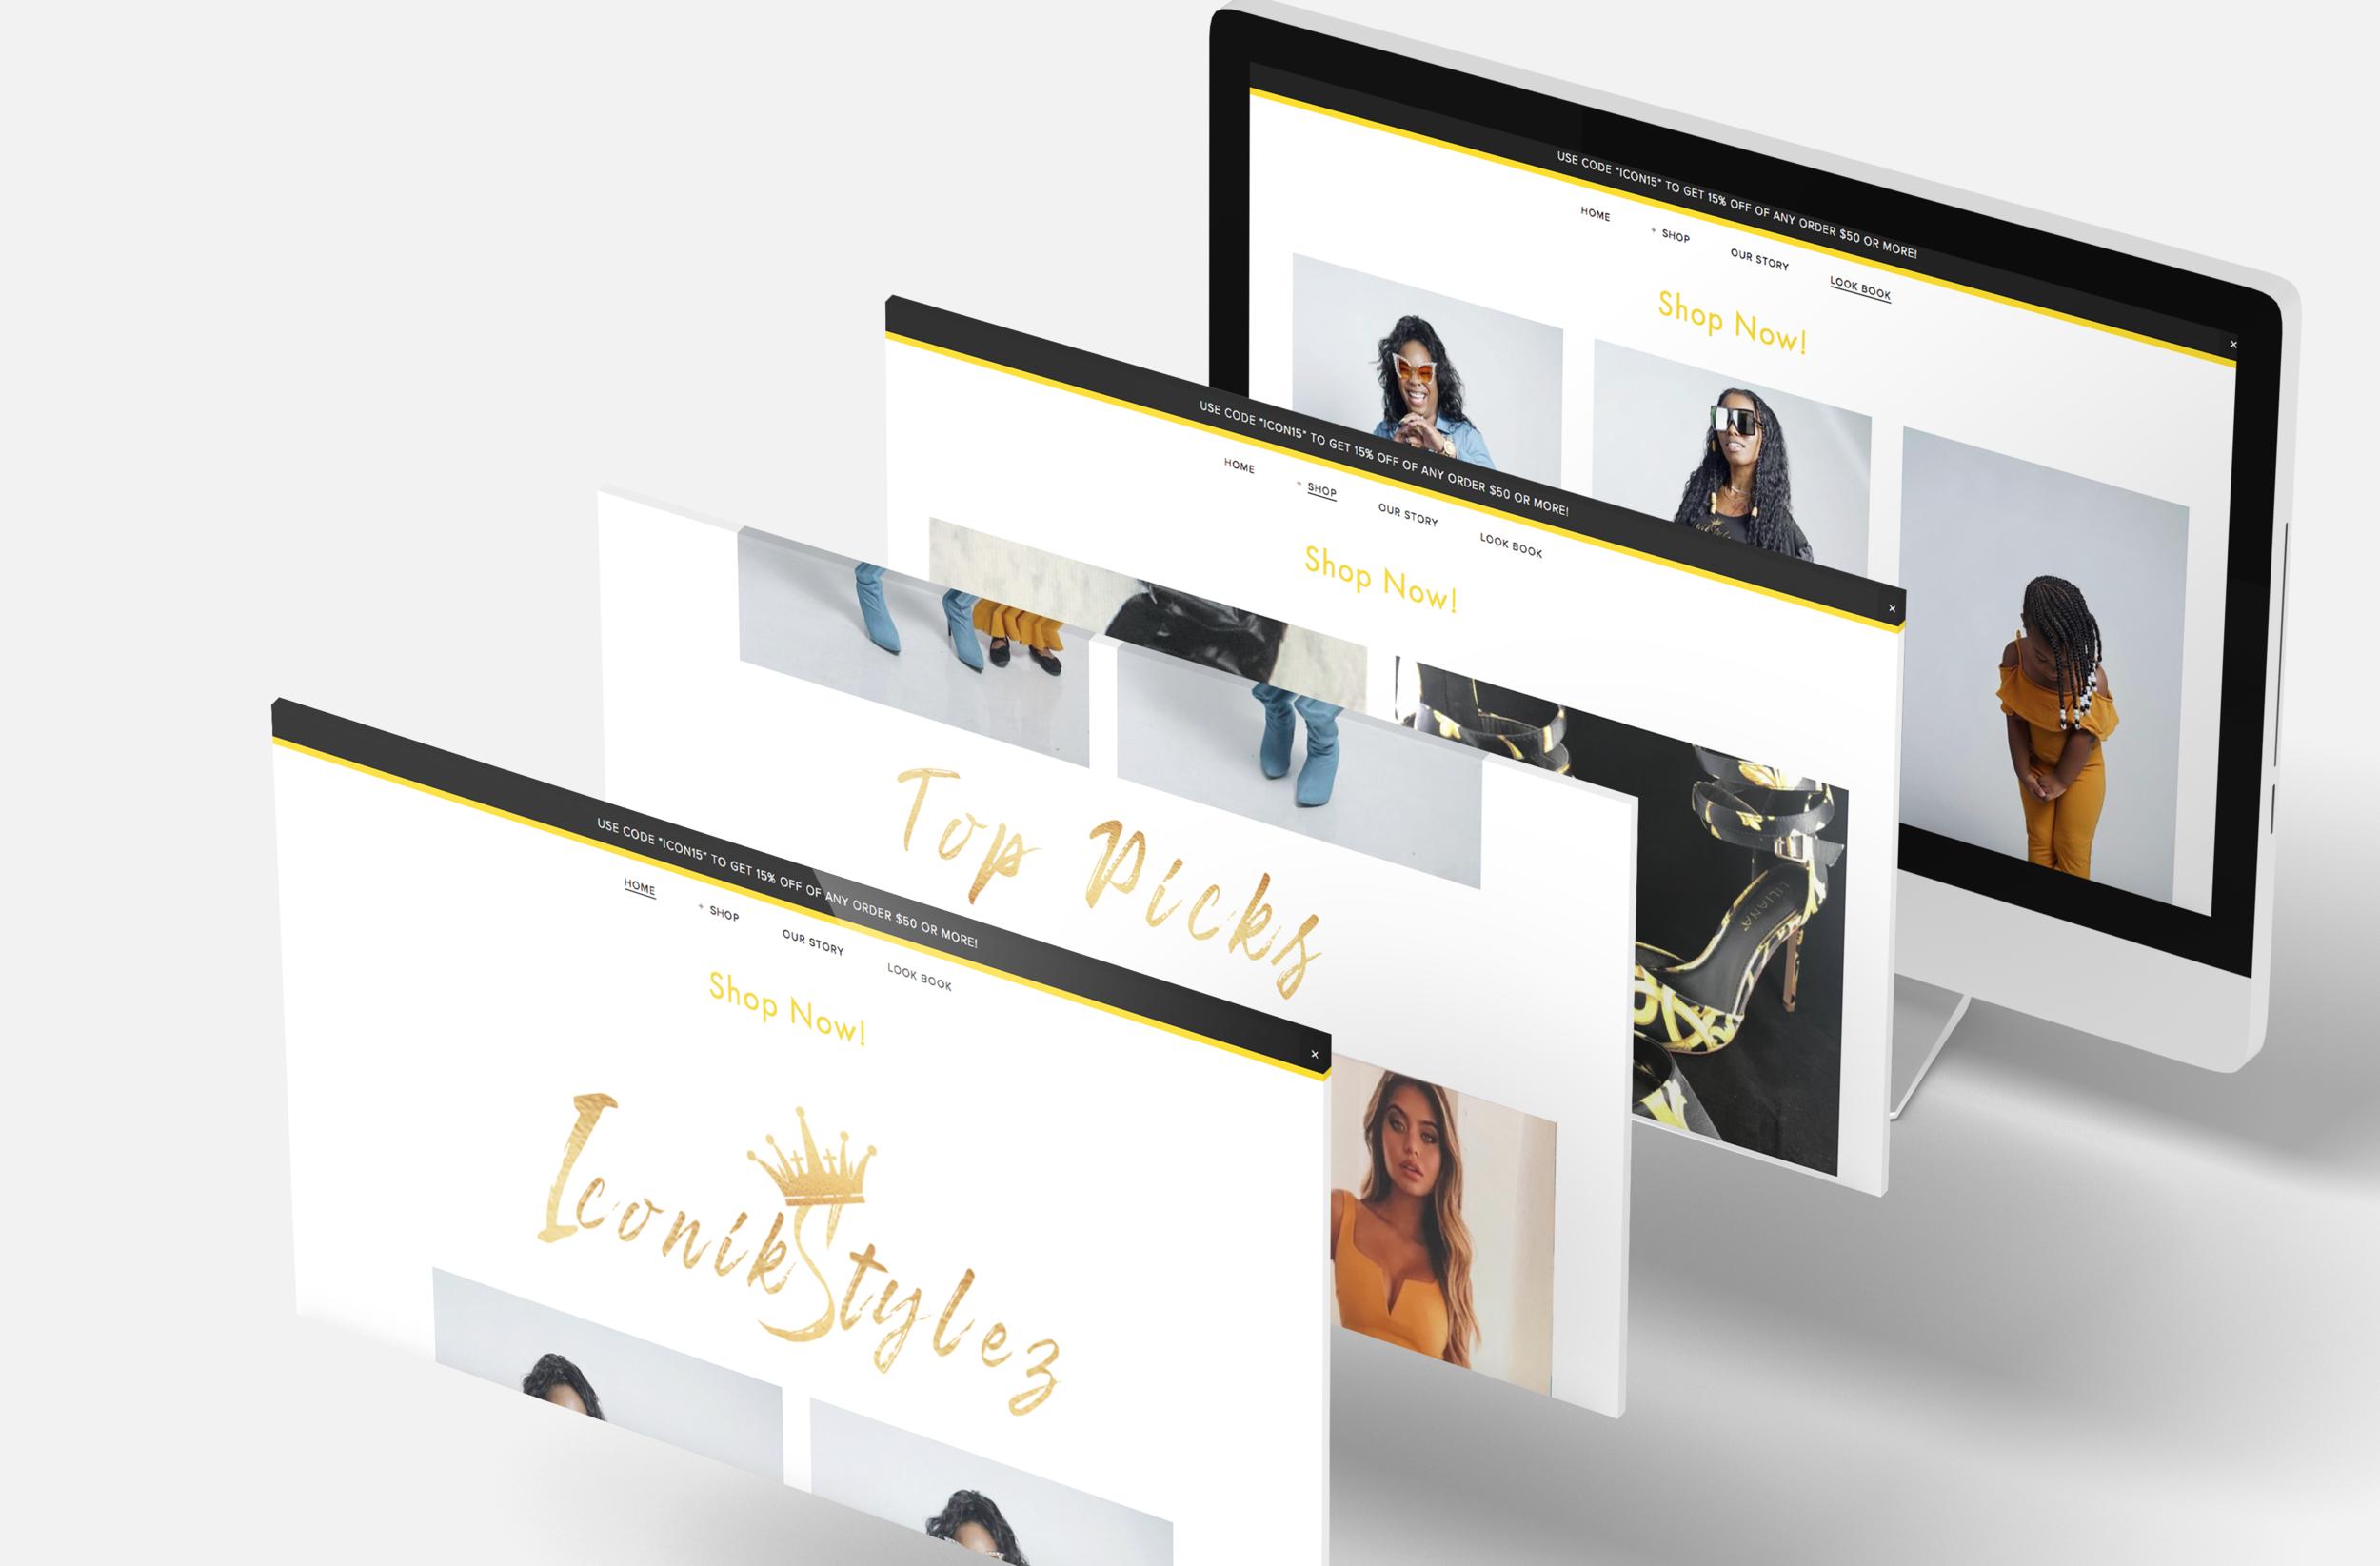 Iconik Stylez Website Portfolio.png